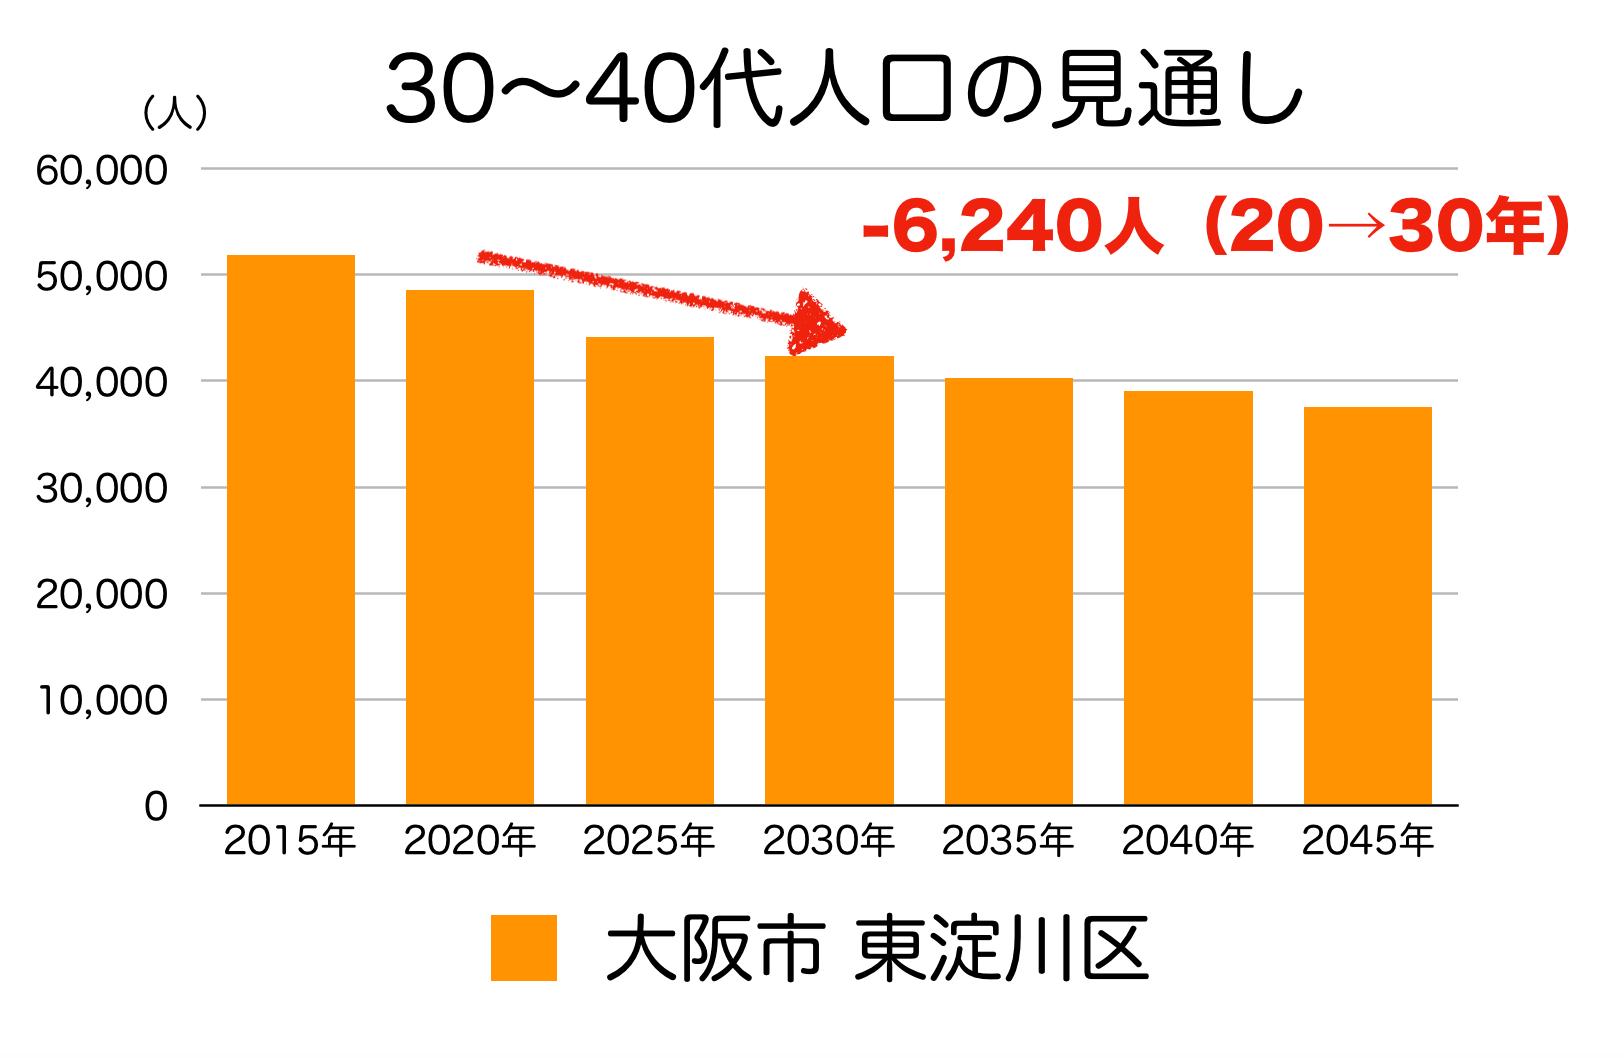 大阪市東淀川区の30〜40代人口の予測